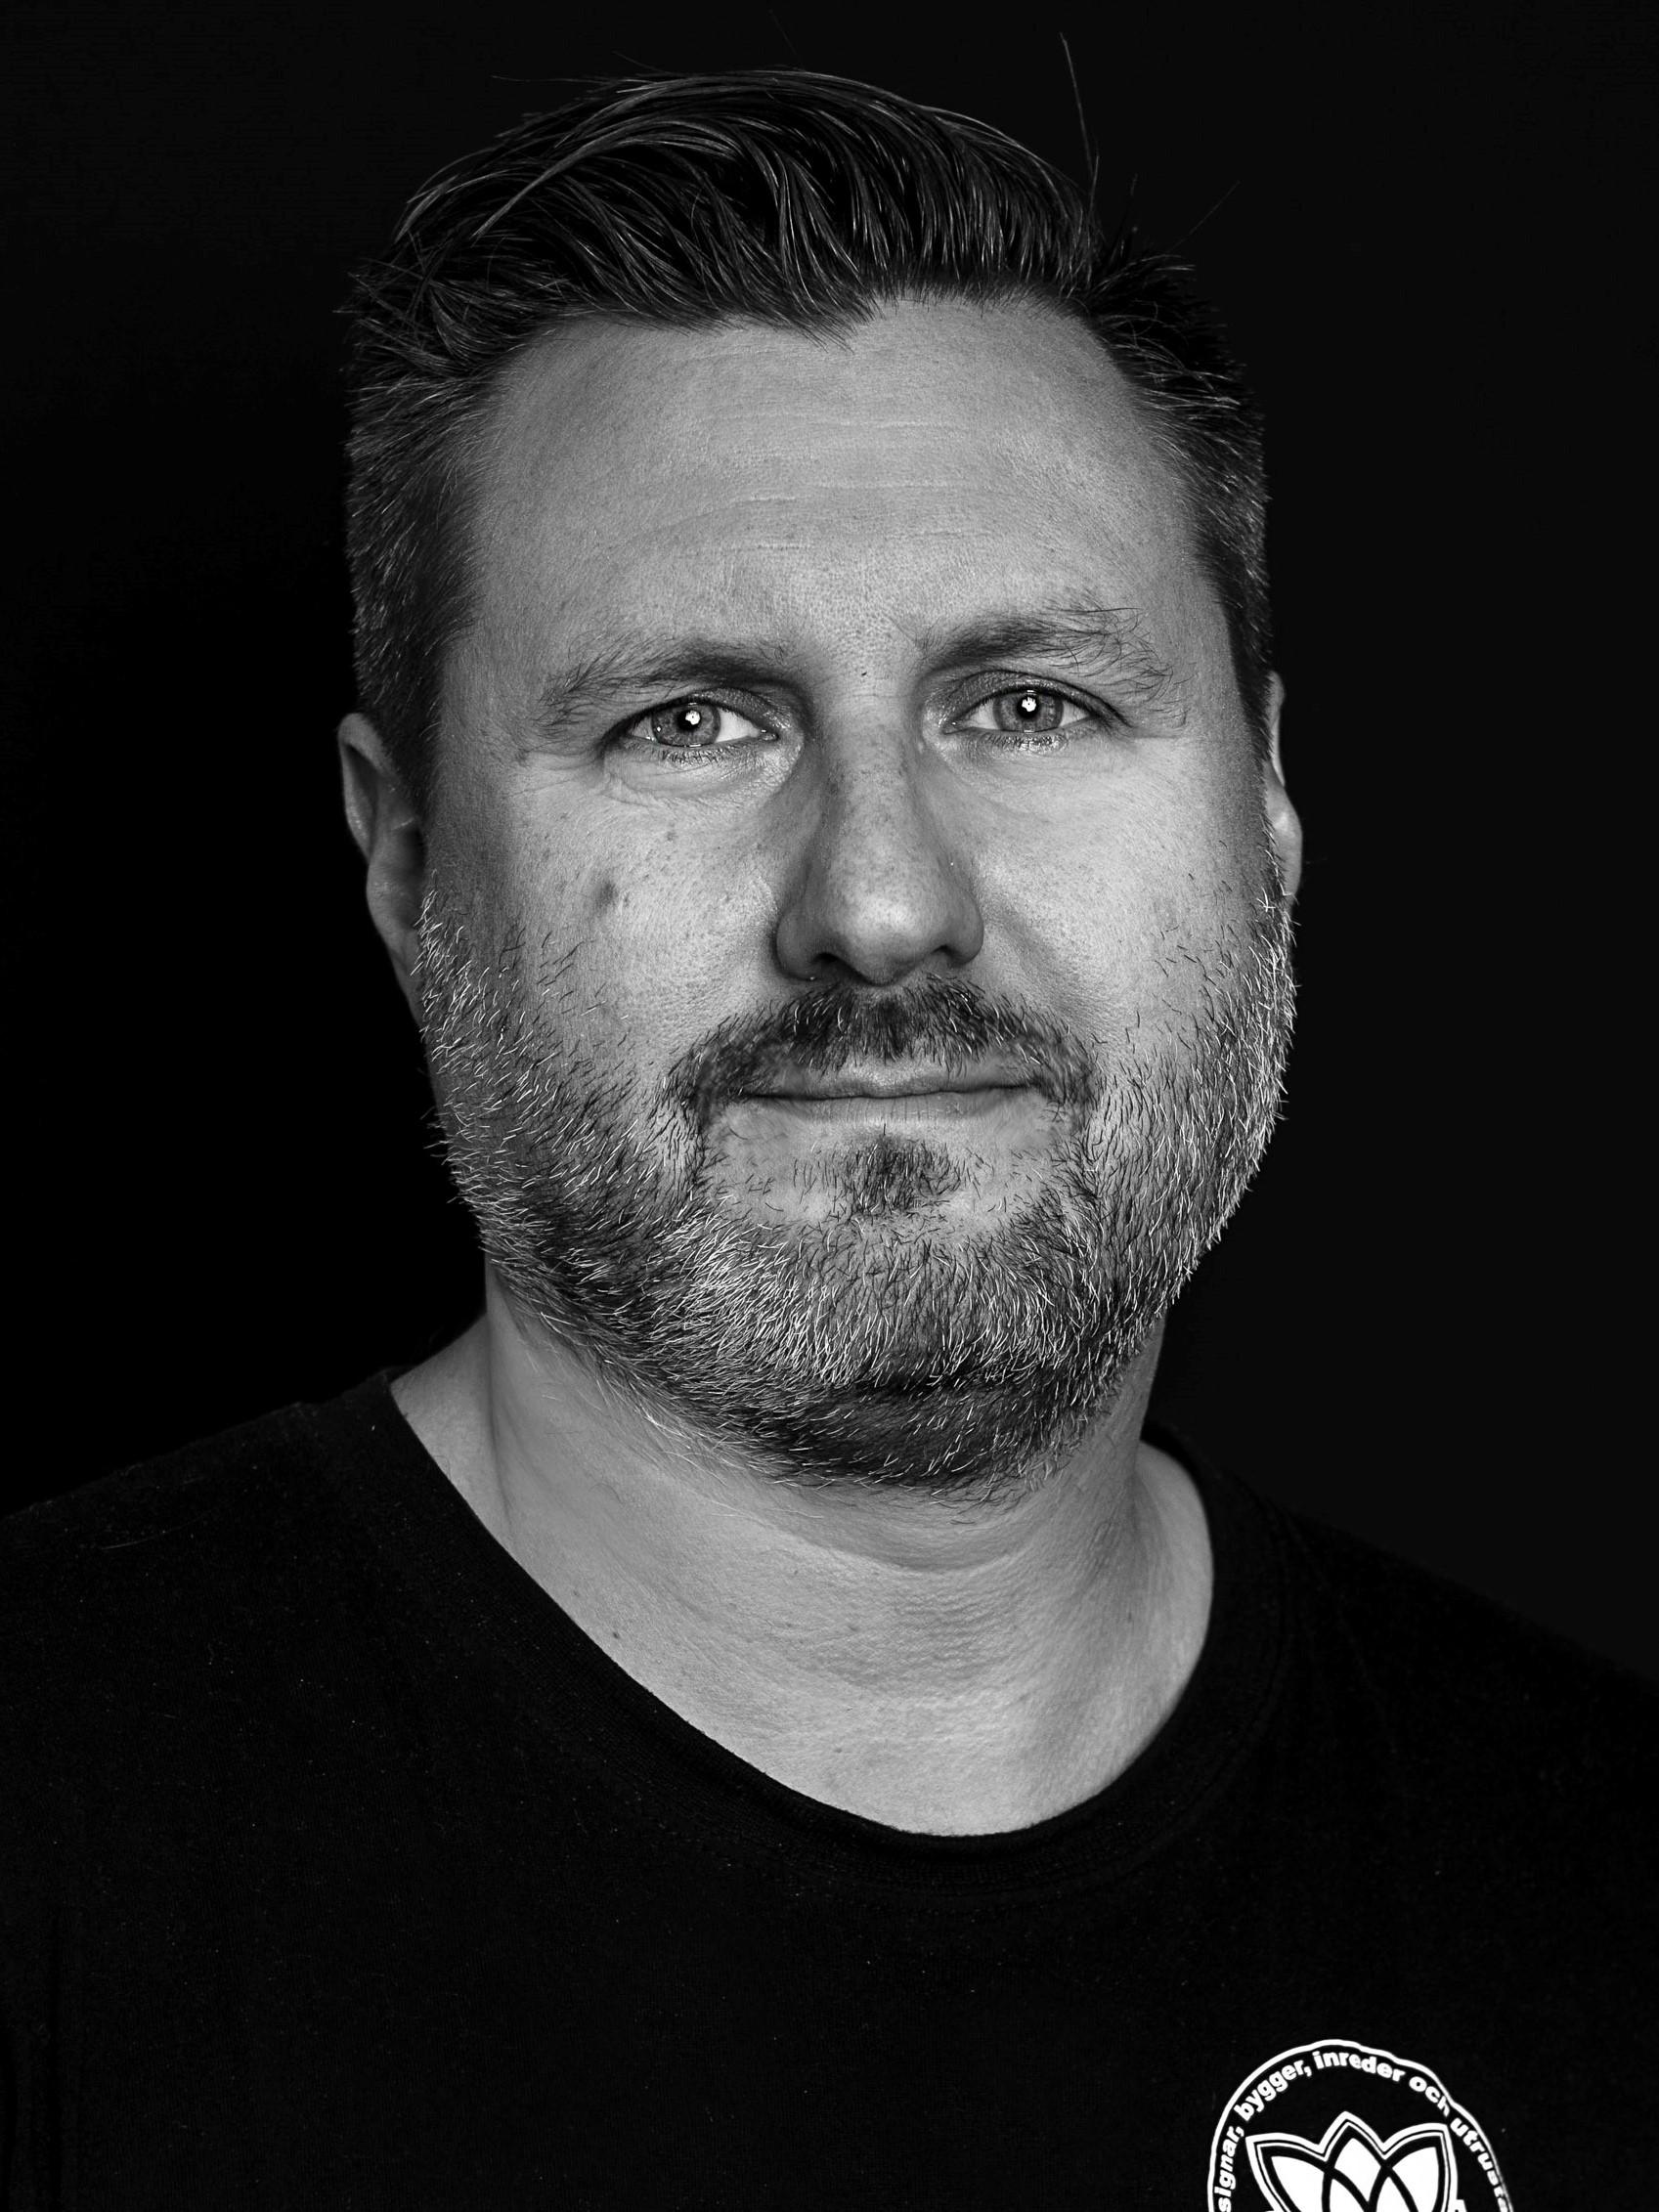 Fredrik Turesson